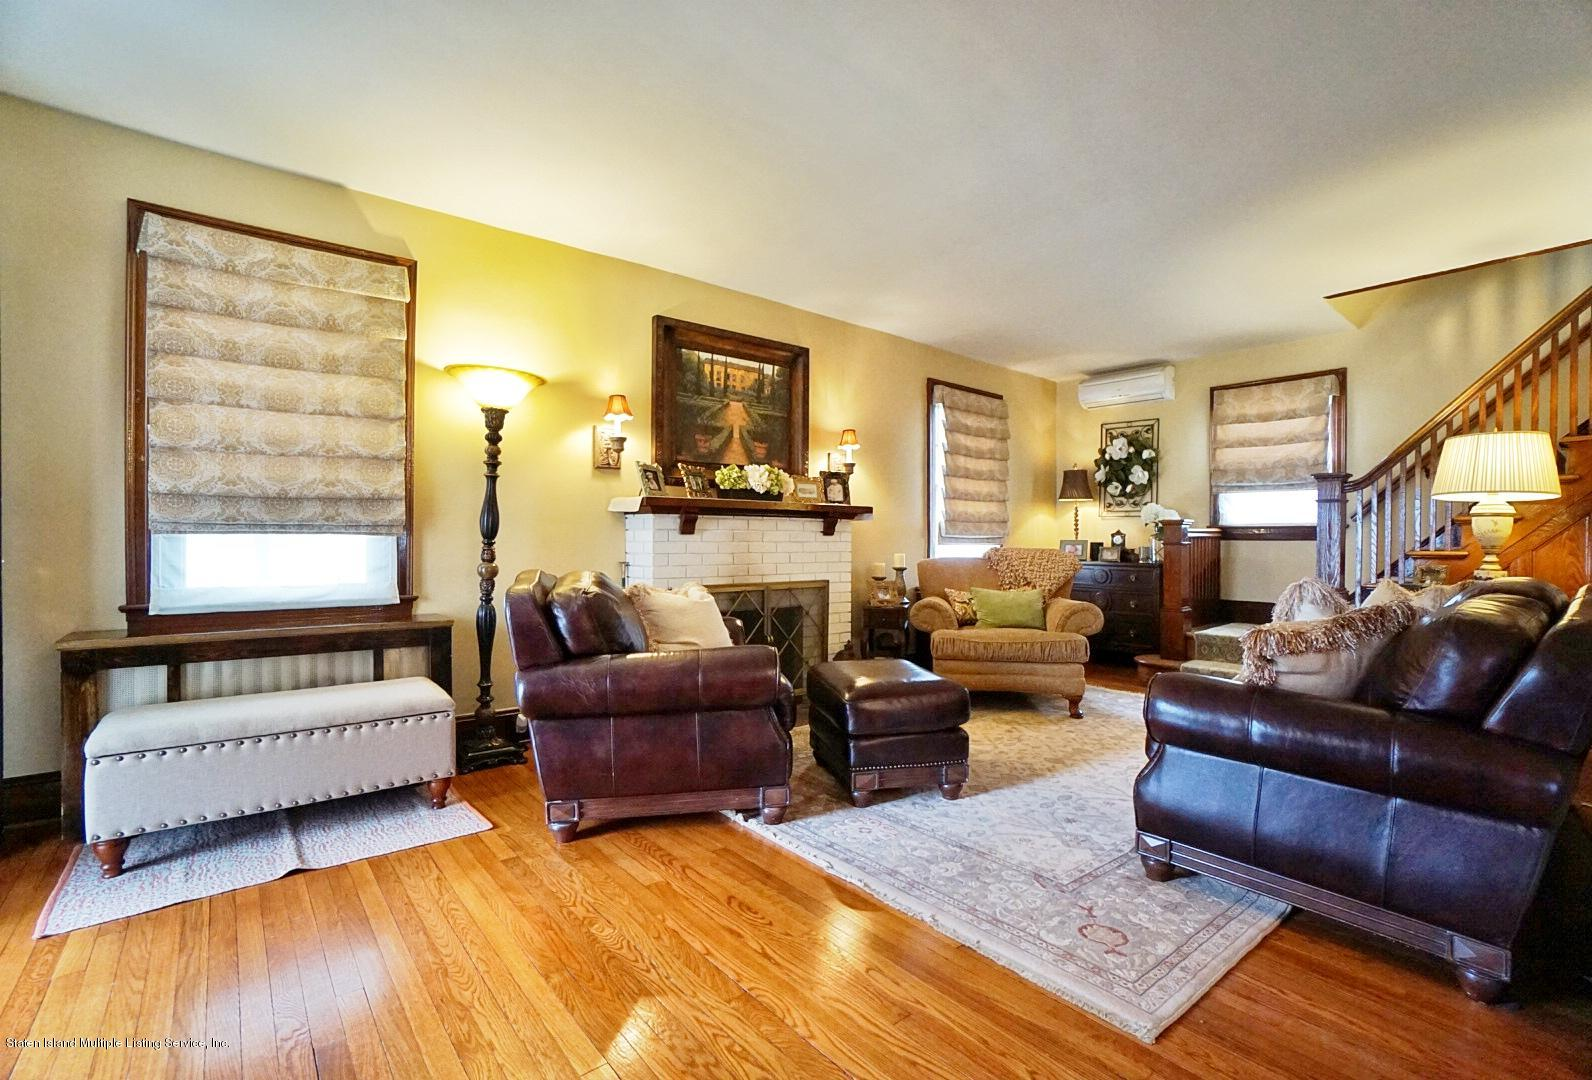 Single Family - Detached 171 Keiber Court  Staten Island, NY 10314, MLS-1127425-10